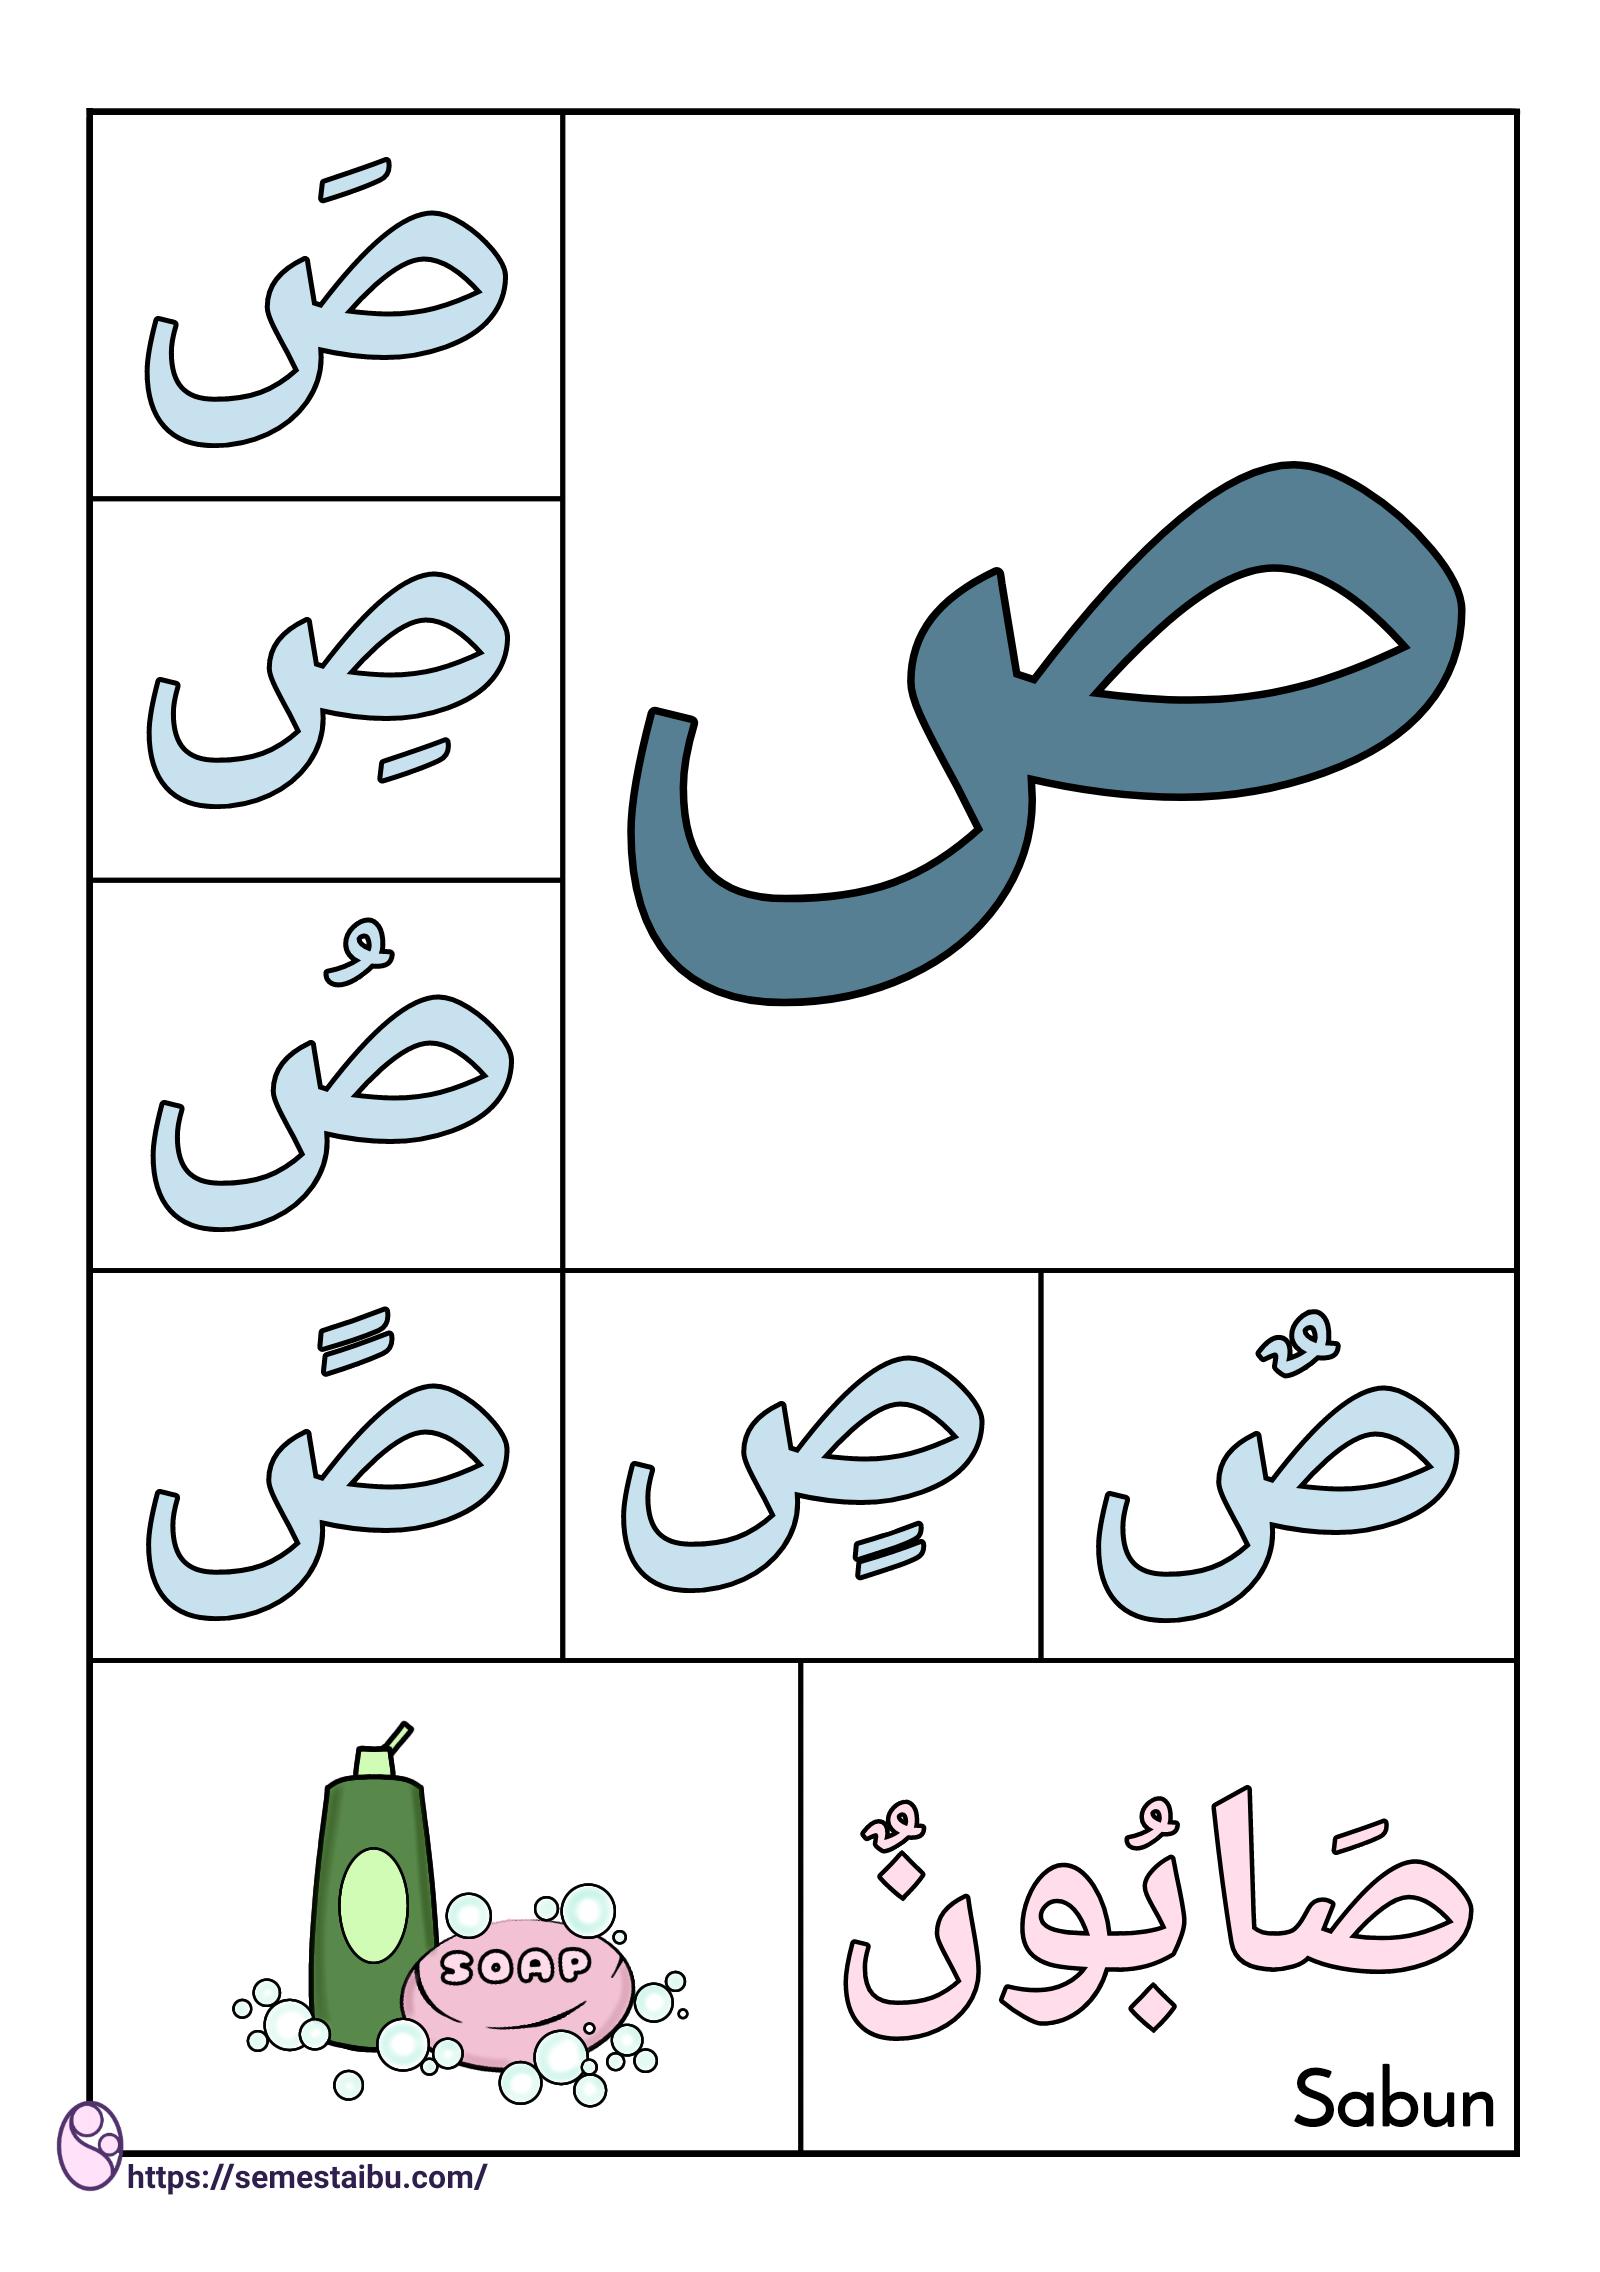 mengenal huruf hijaiyah dan tanda bacanya - flashcard anak - flashcard hijaiyah